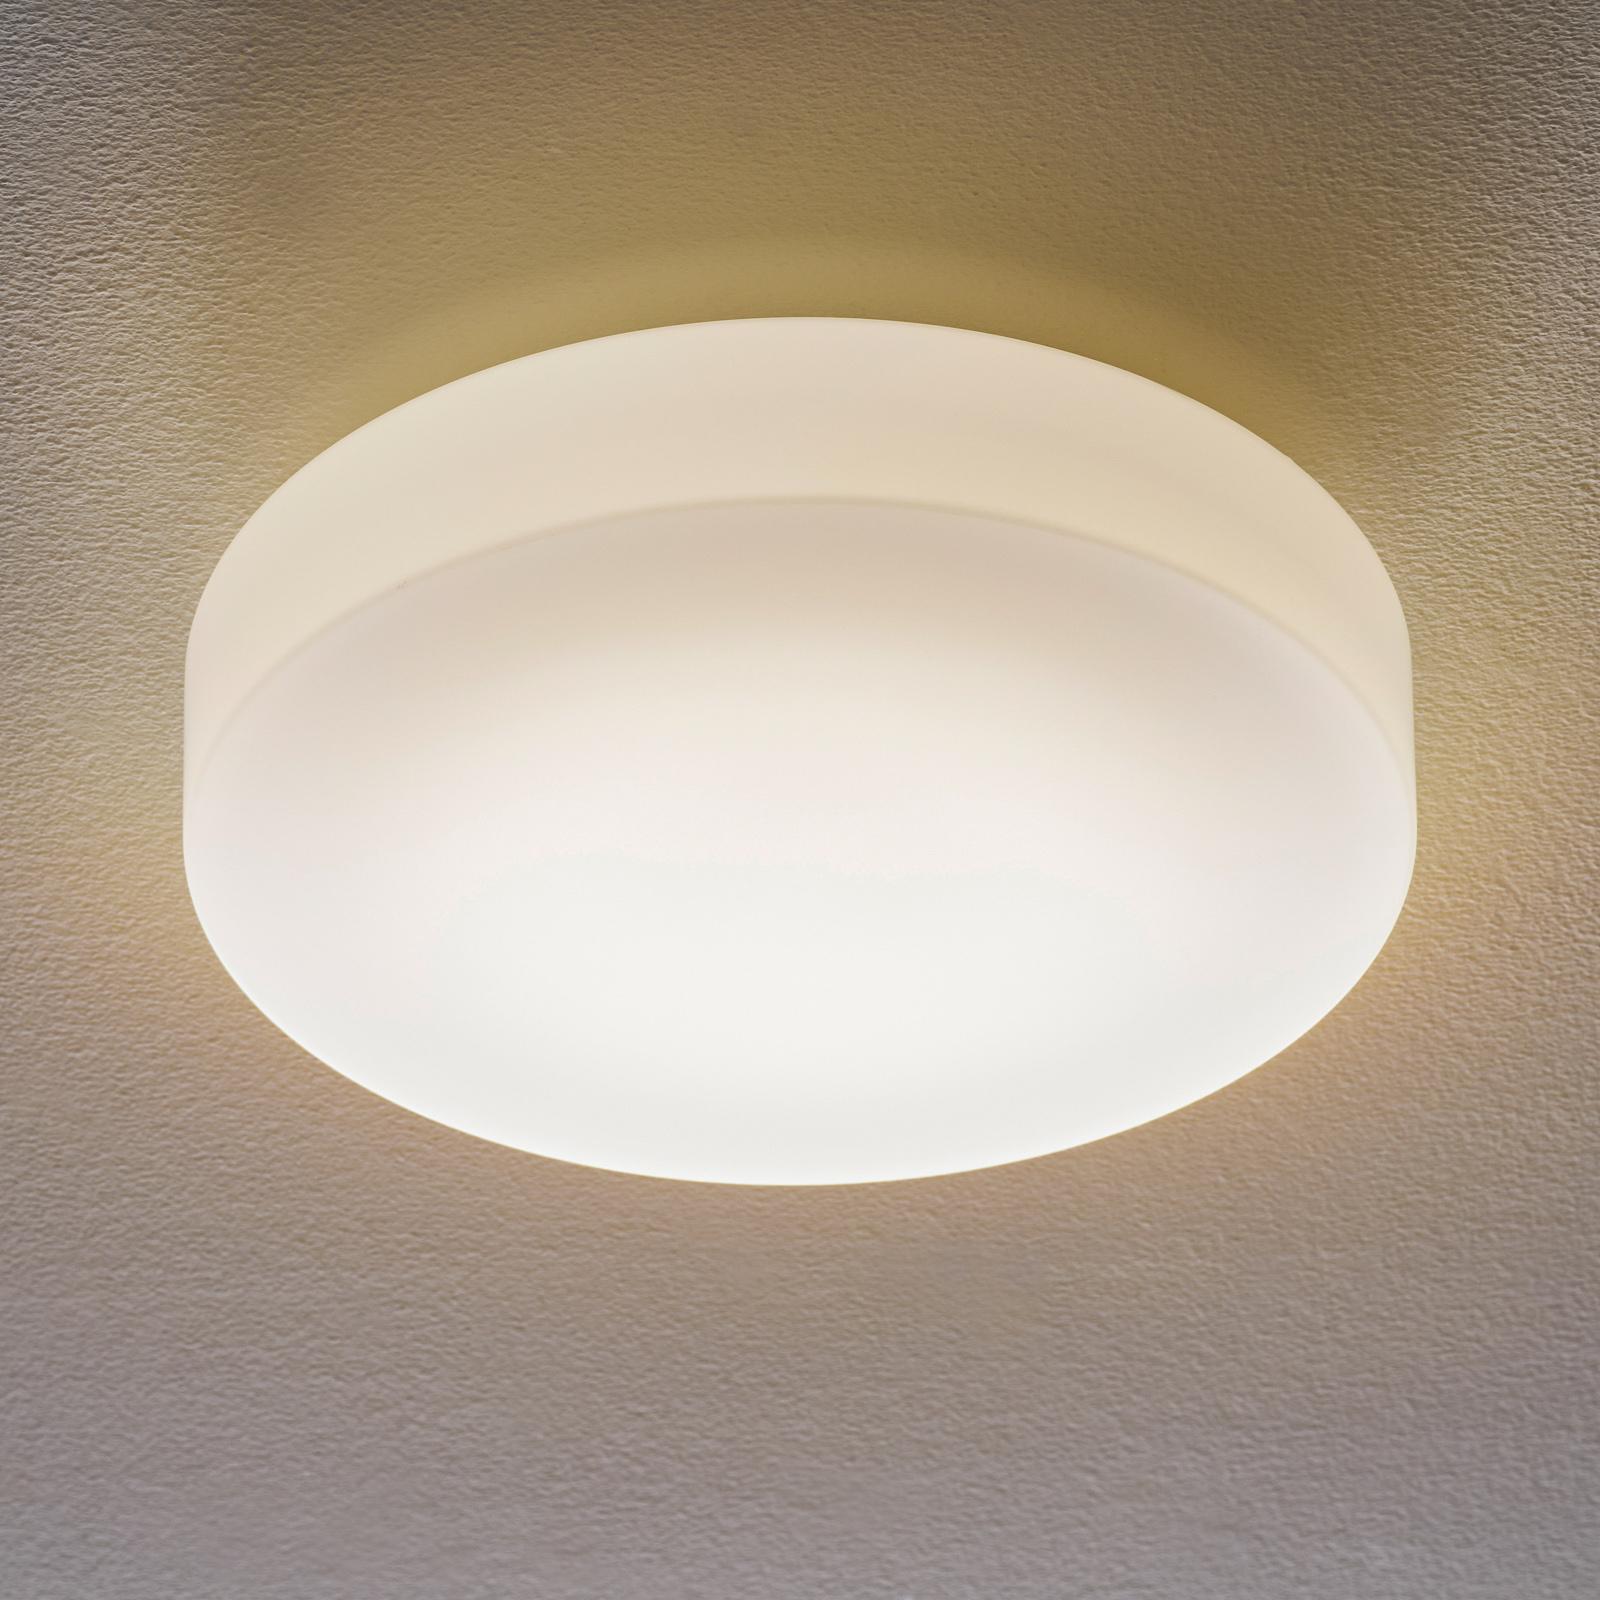 BEGA 50651/50652 LED-kattovalaisin opaalilasi